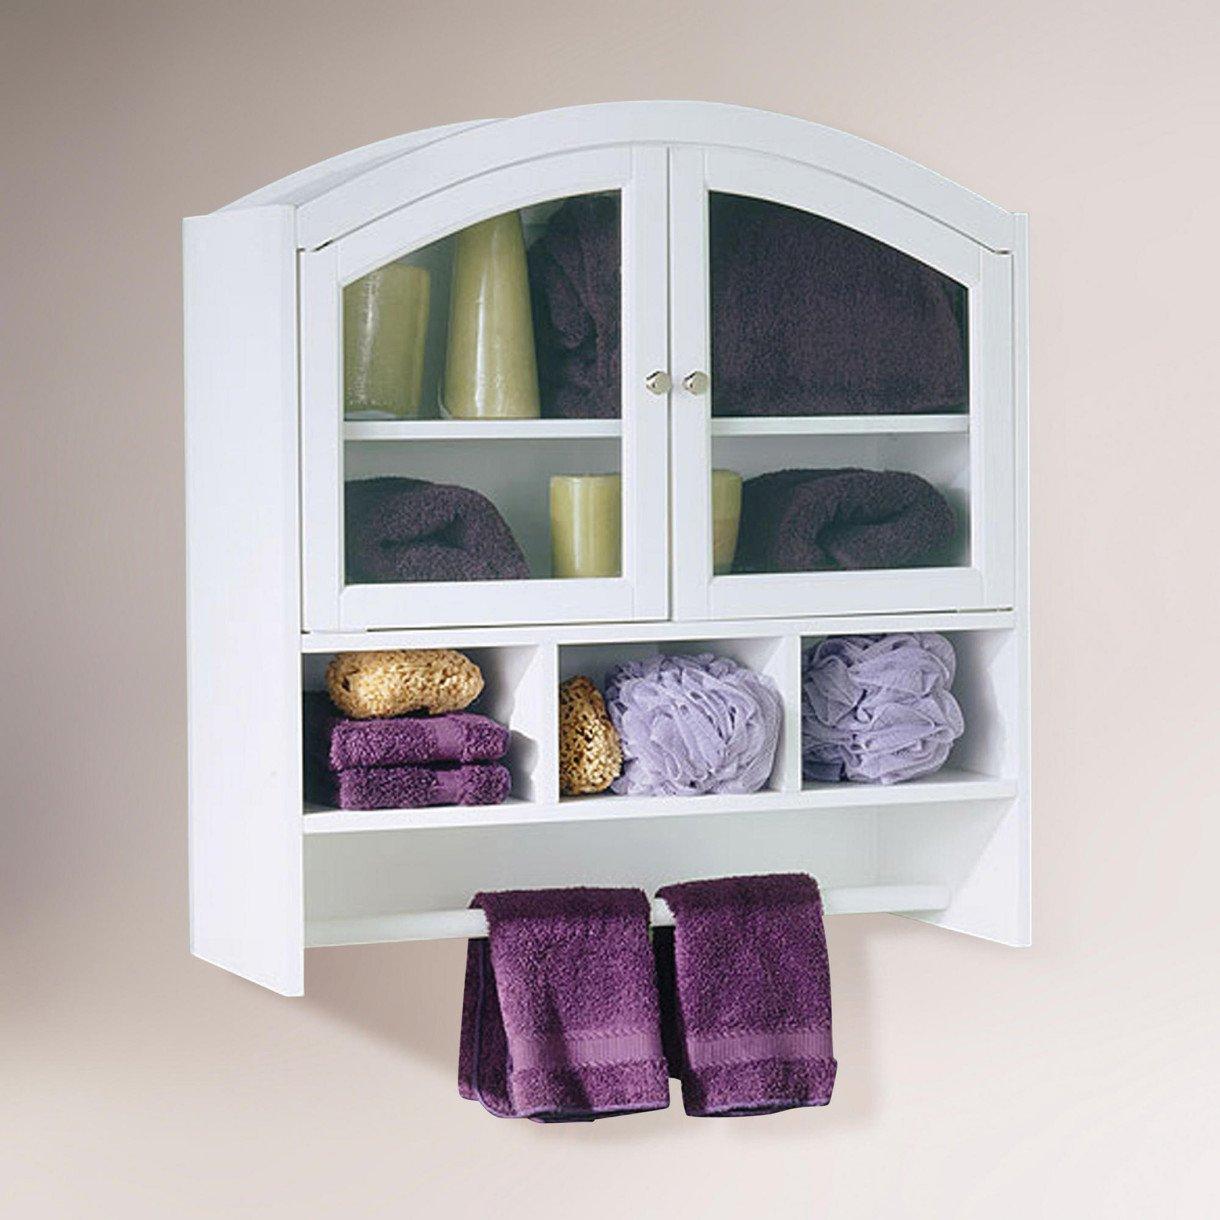 Bathroom wall cabinet with towel bar home furniture design - Bathroom wall cabinet with towel bar ...